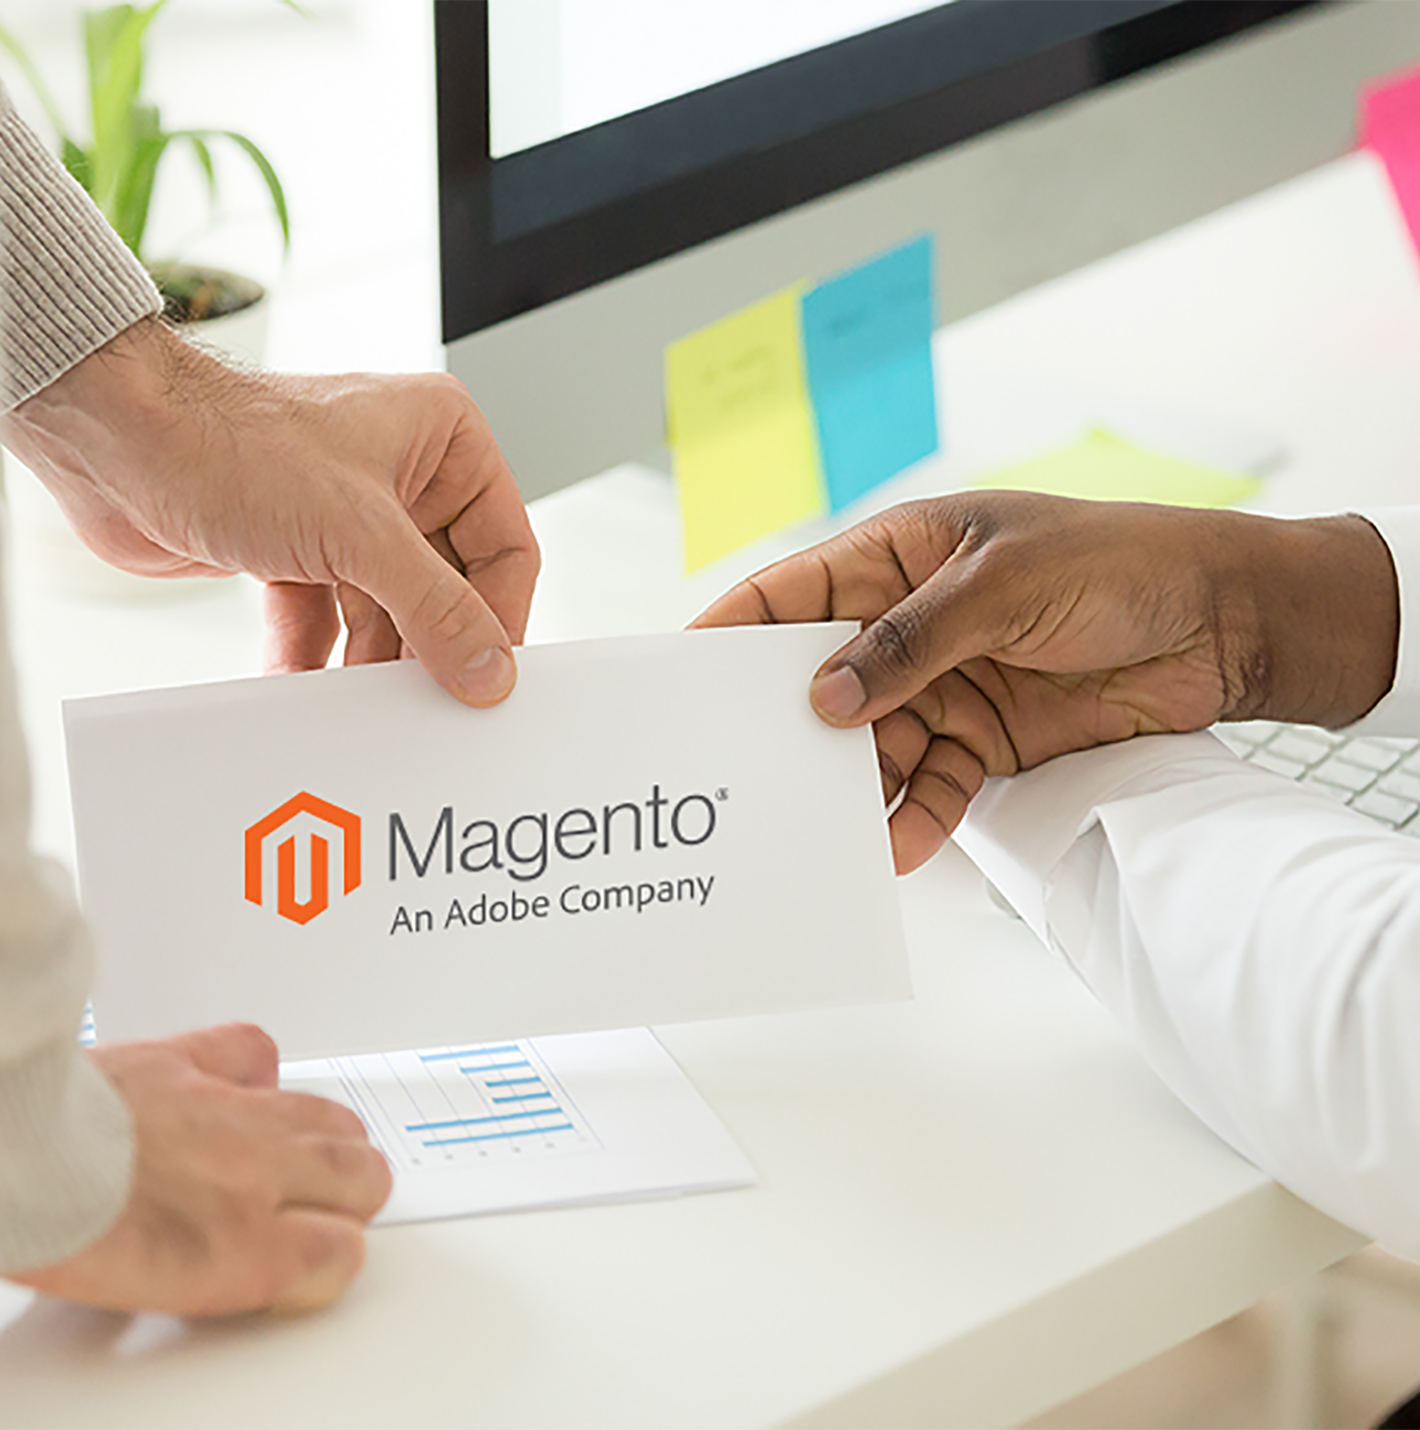 Benefit of Magento